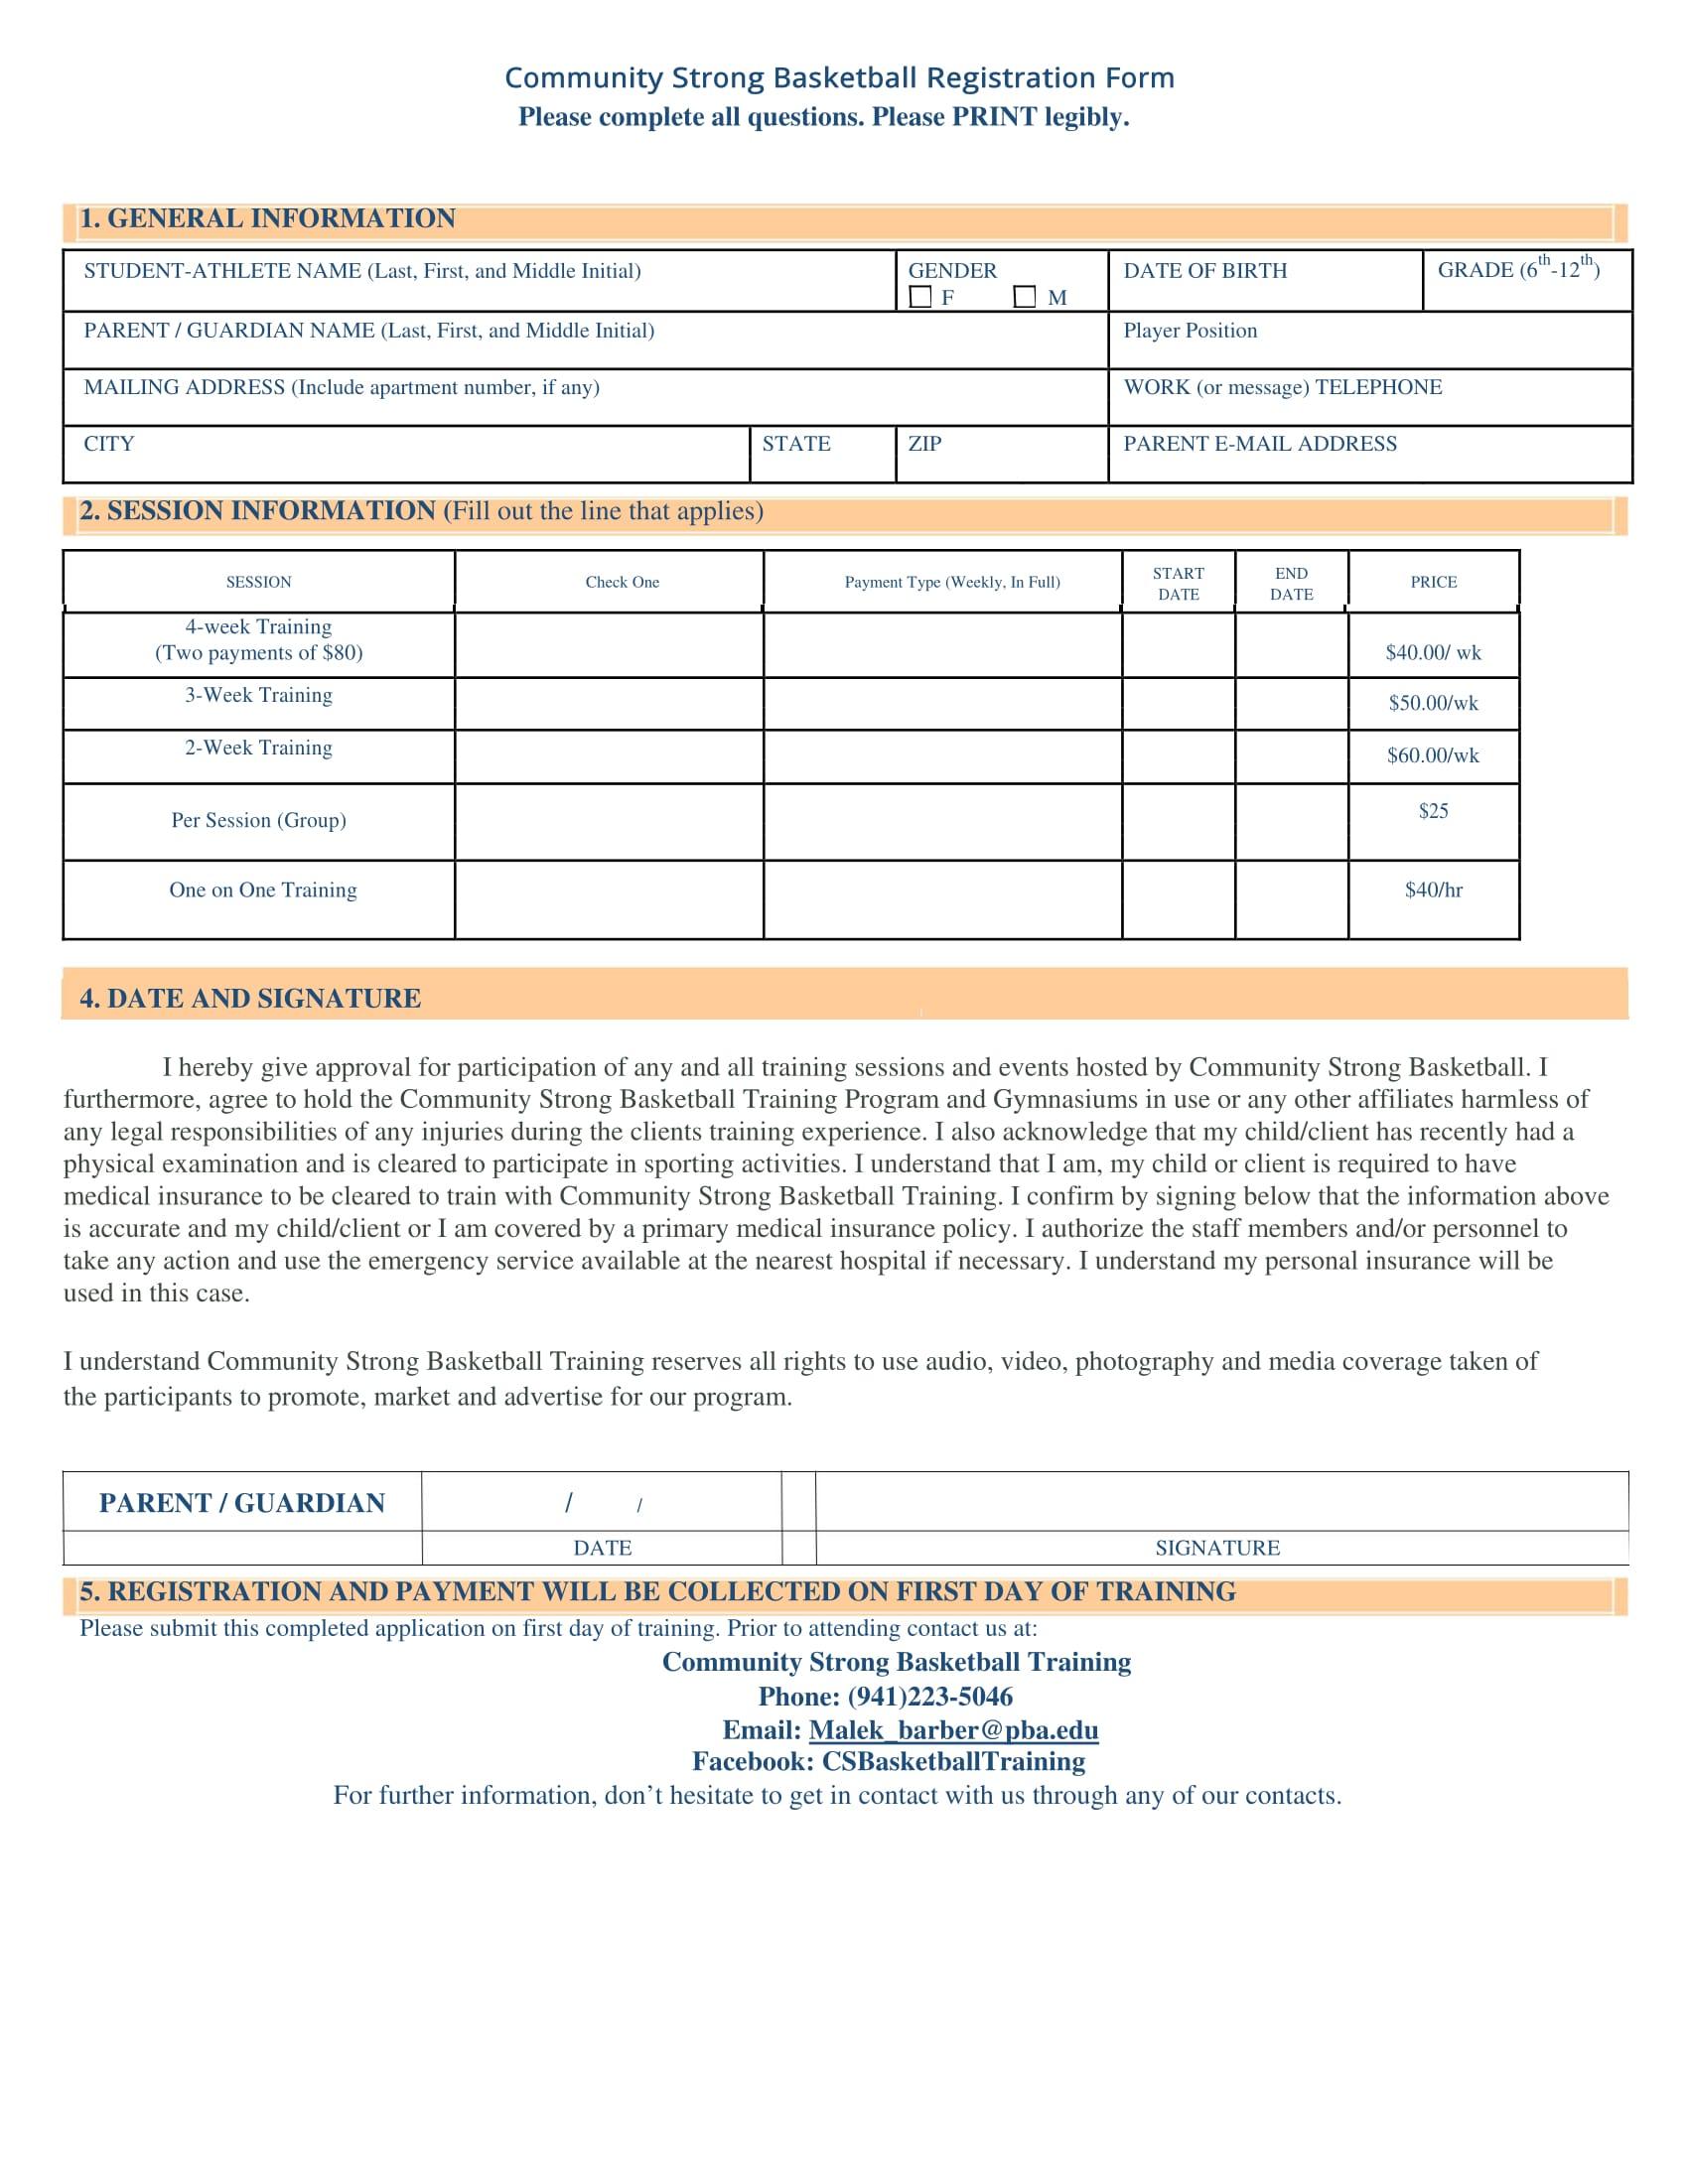 basketball training registration form 2